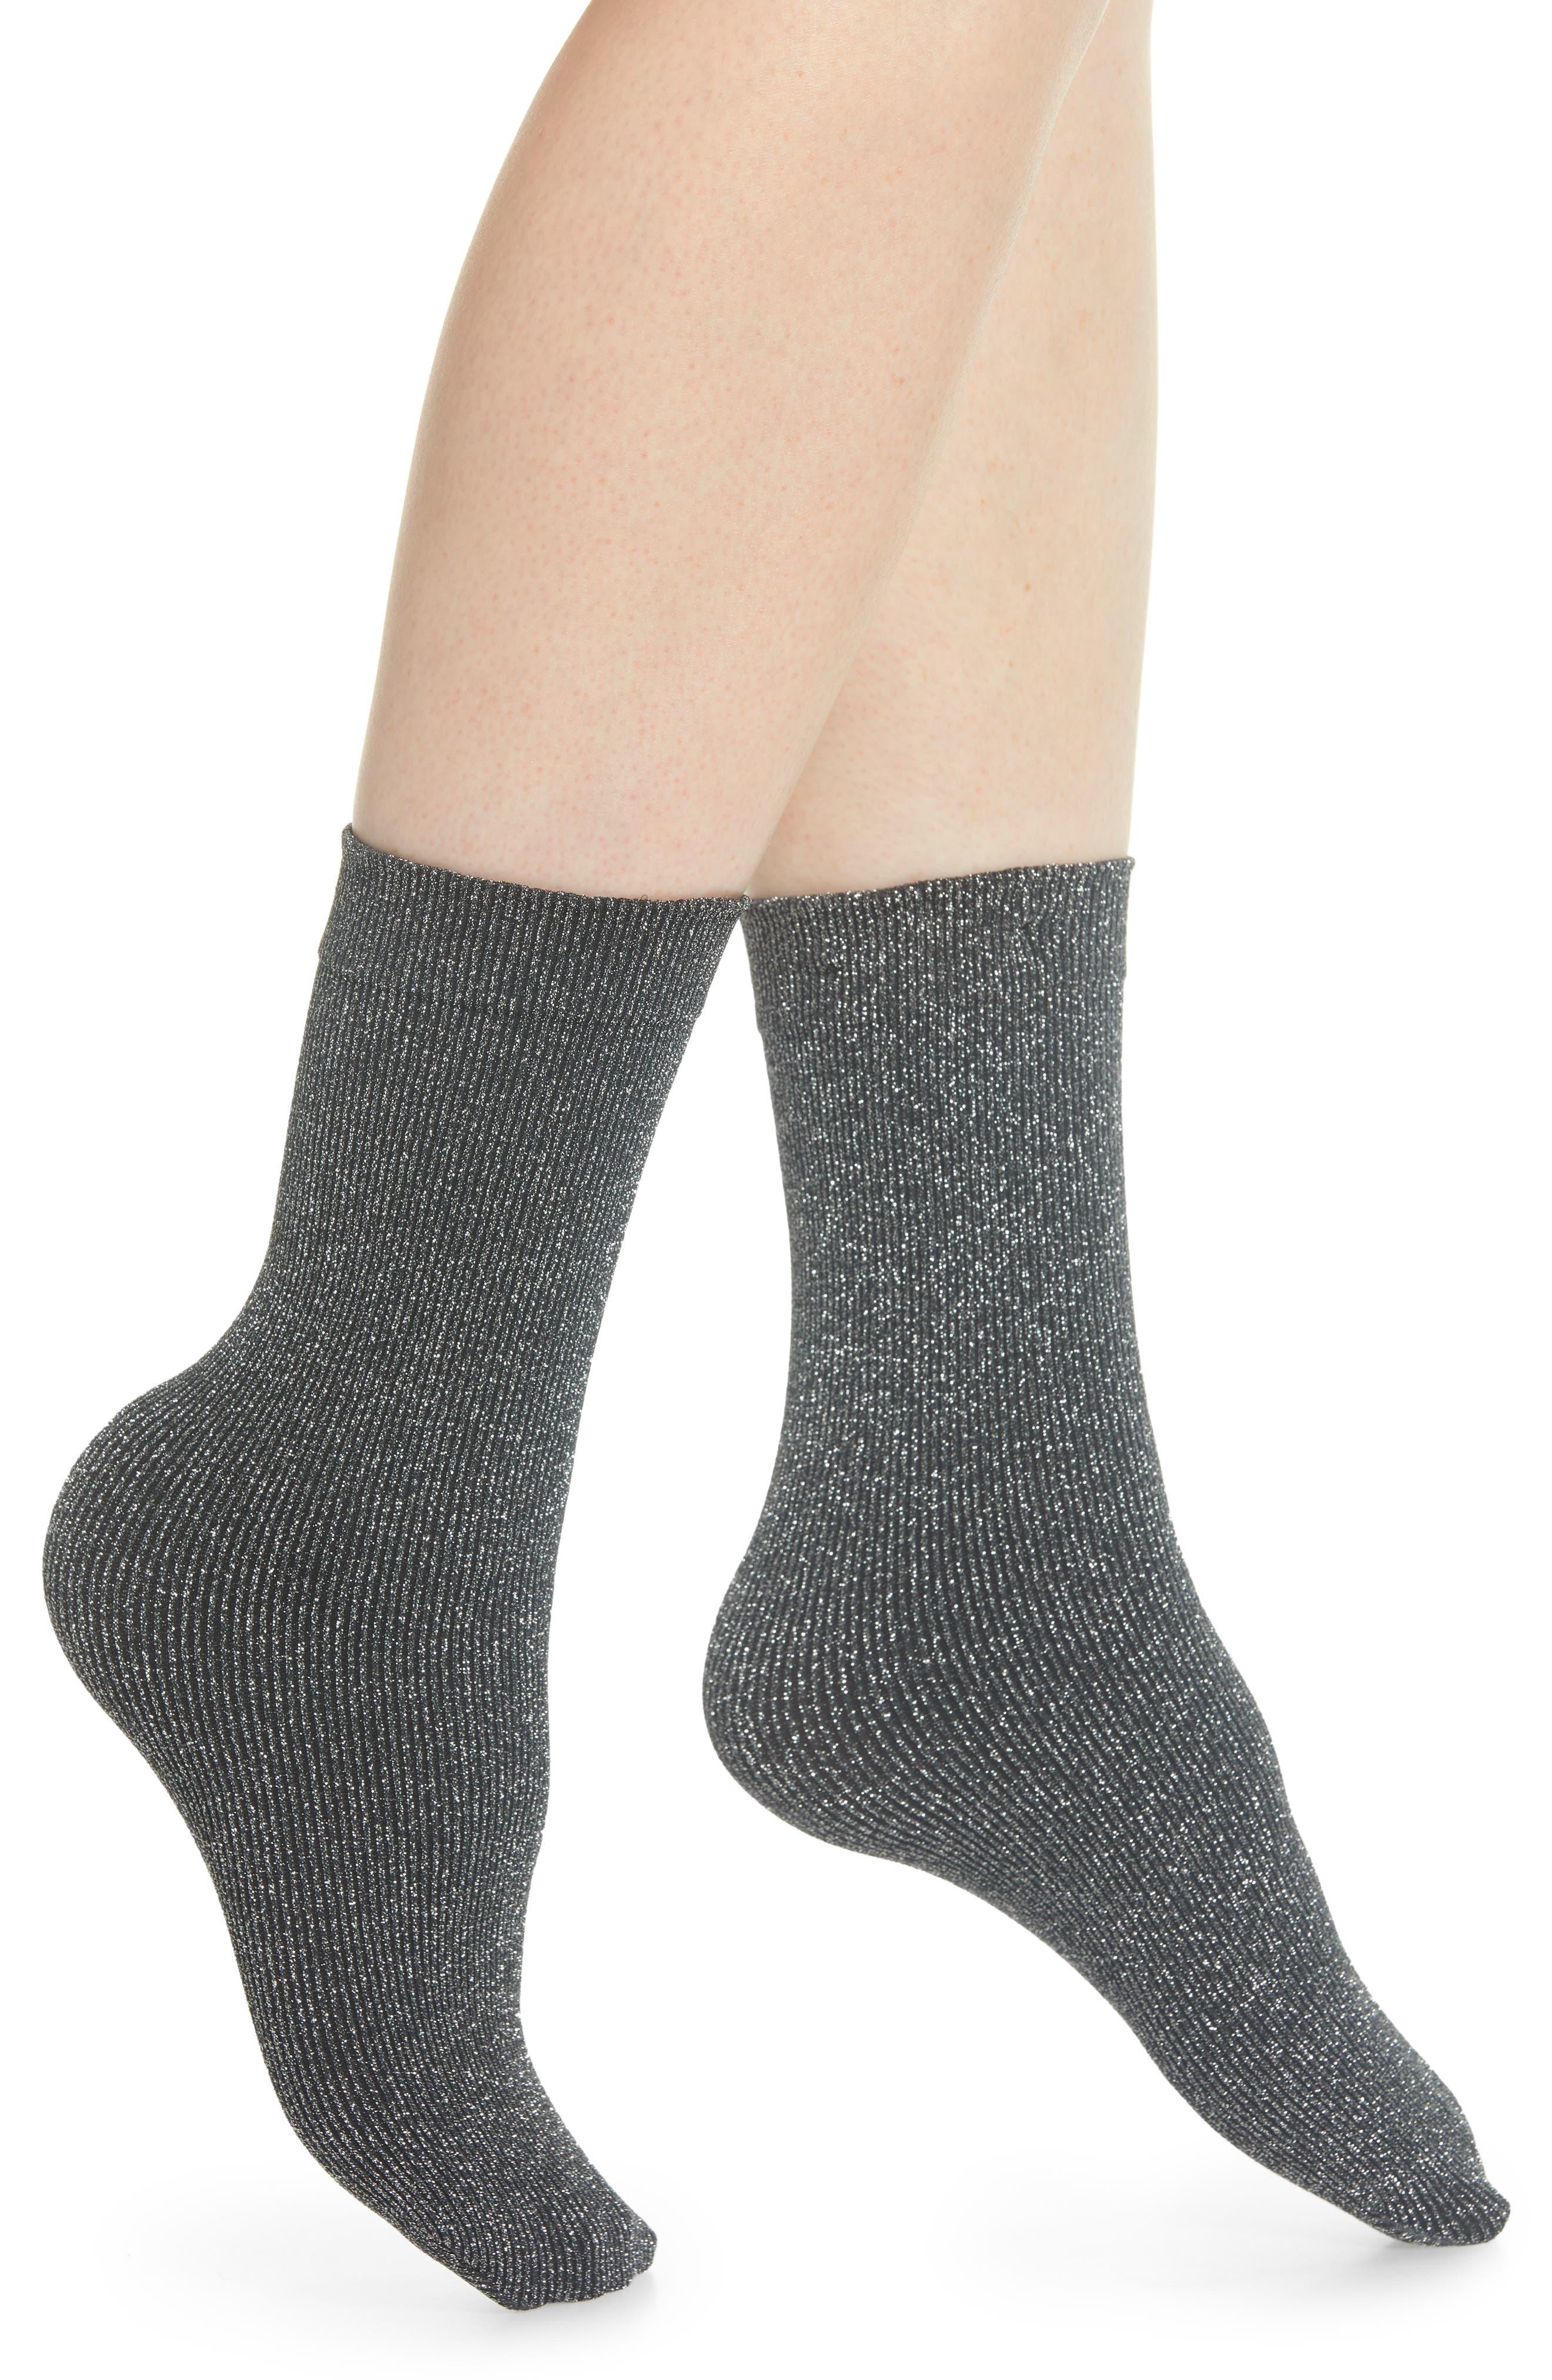 Joan Crew Socks,                             Main thumbnail 1, color,                             BLACK/ LUREX